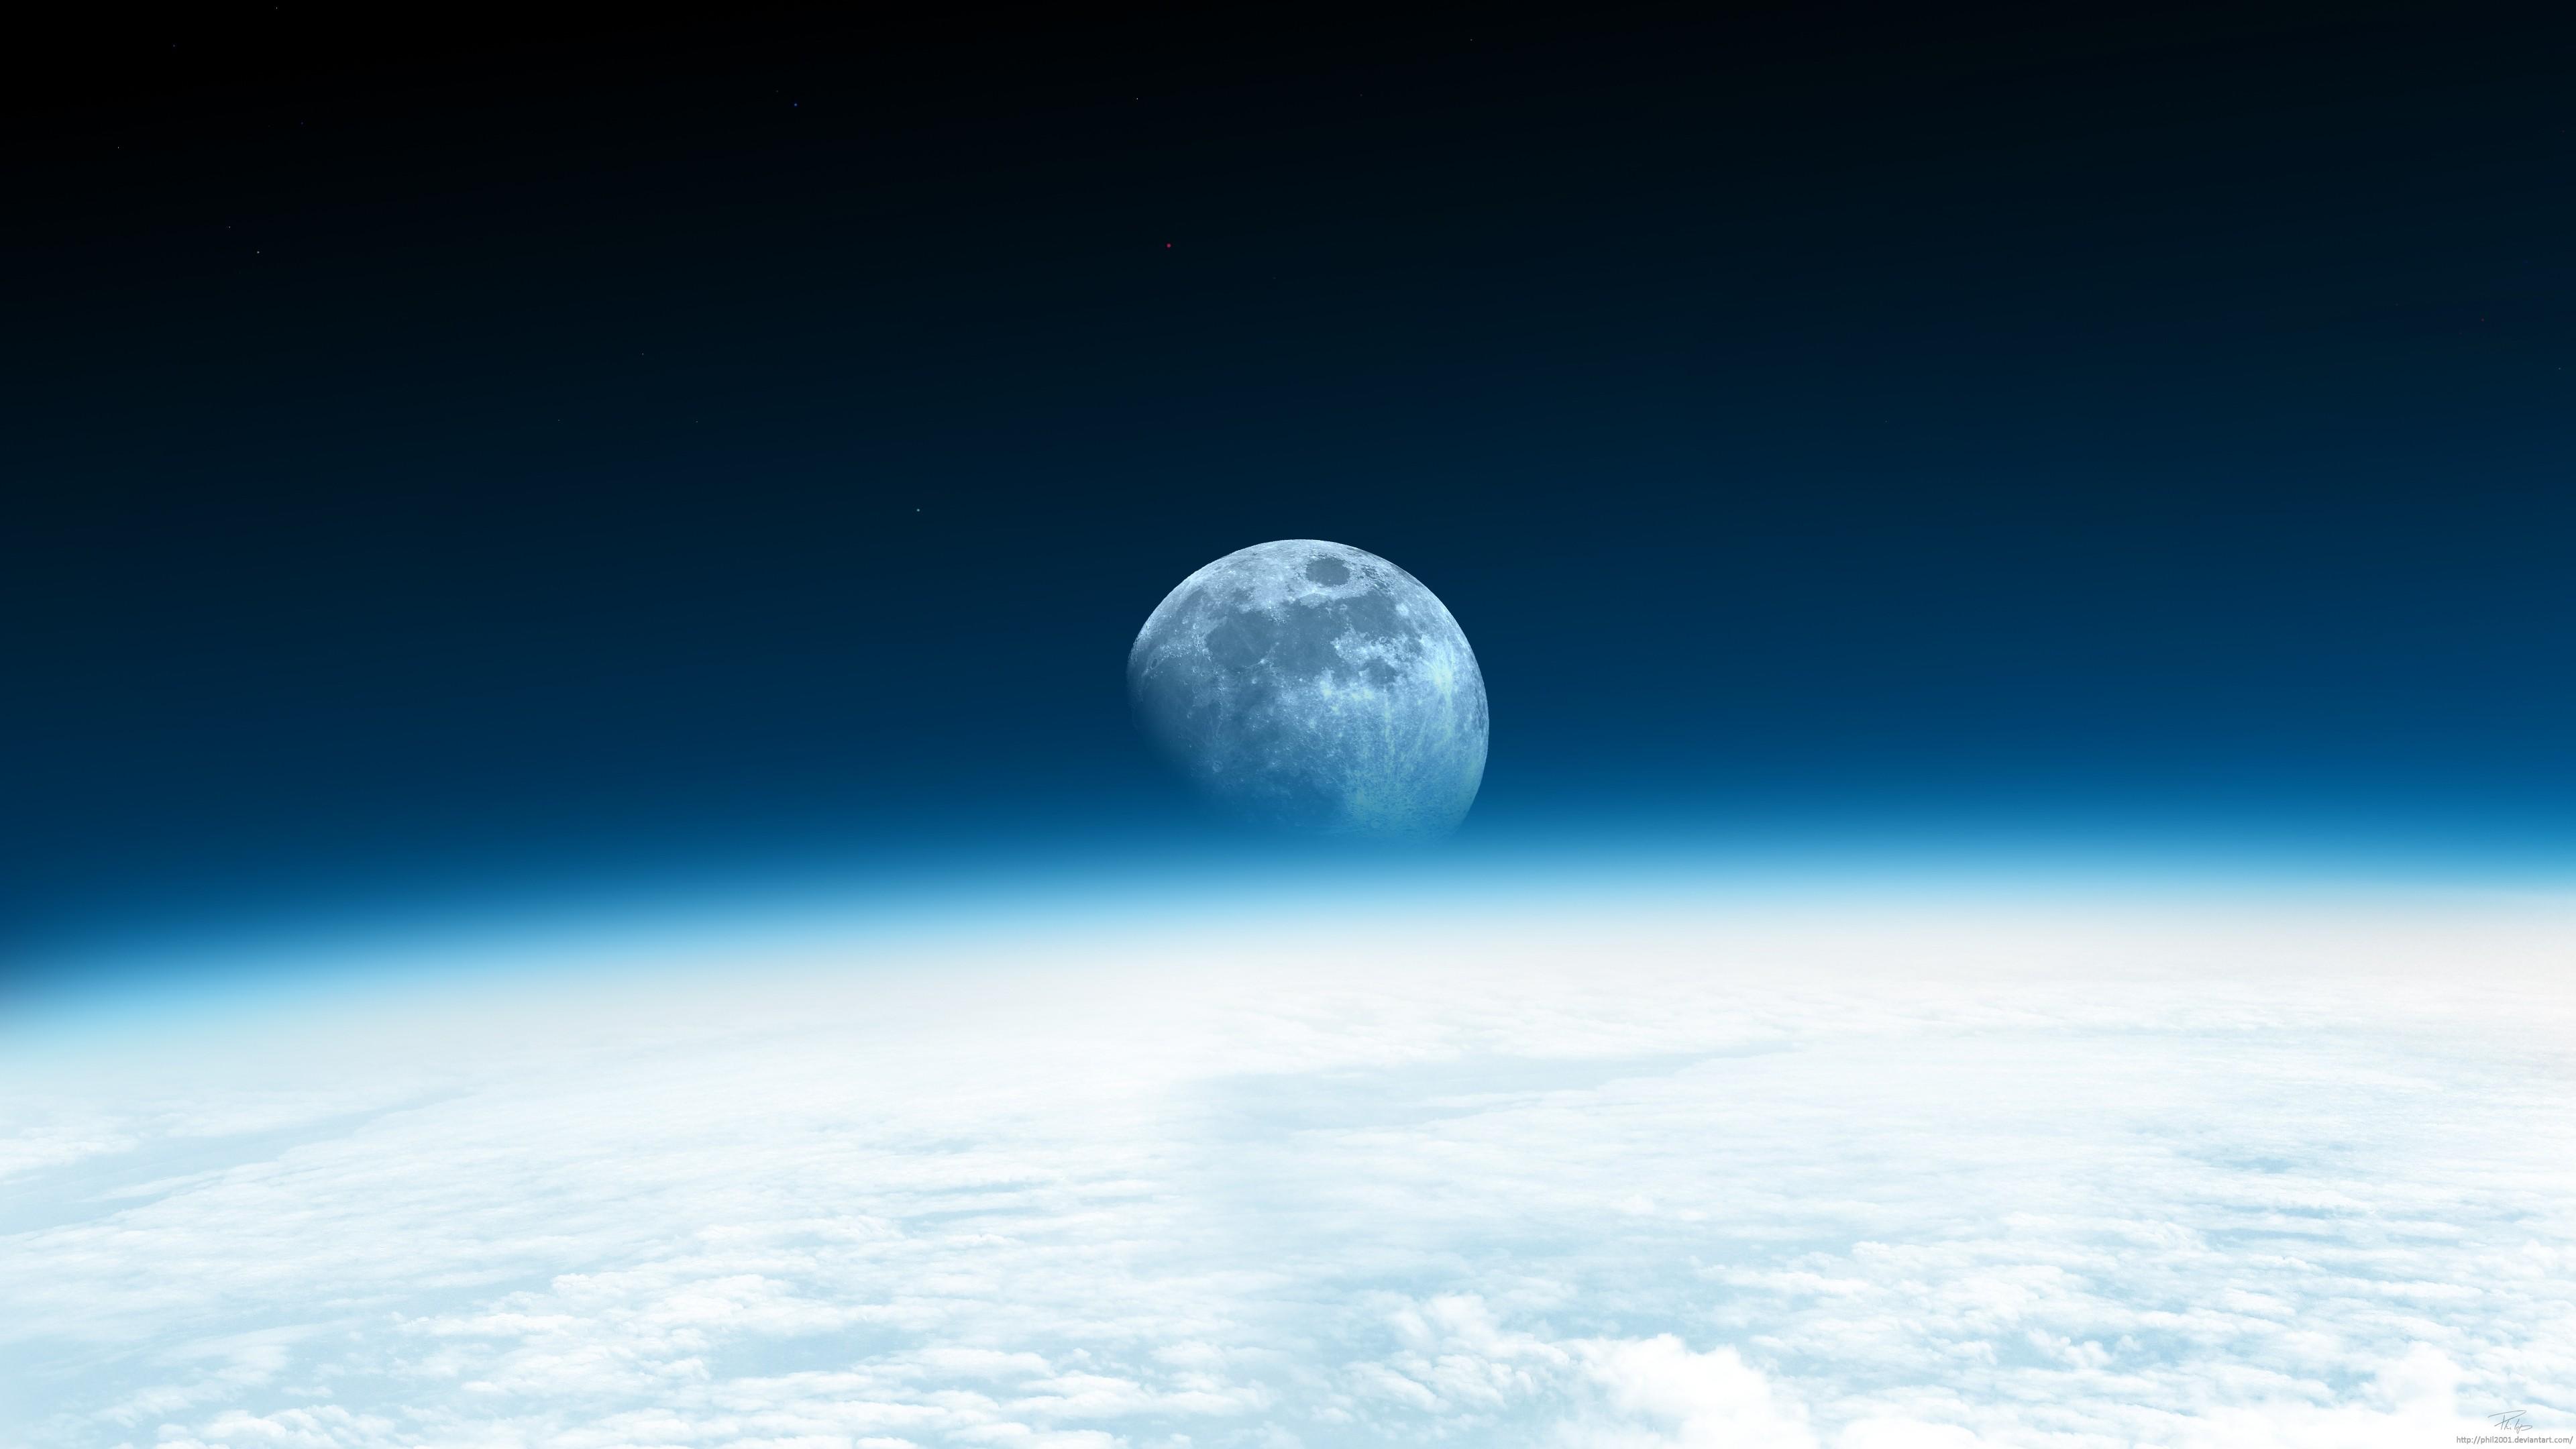 Moon Rise 4k Resolution Background Desktop Wallpapers HD 4k 3840x2160